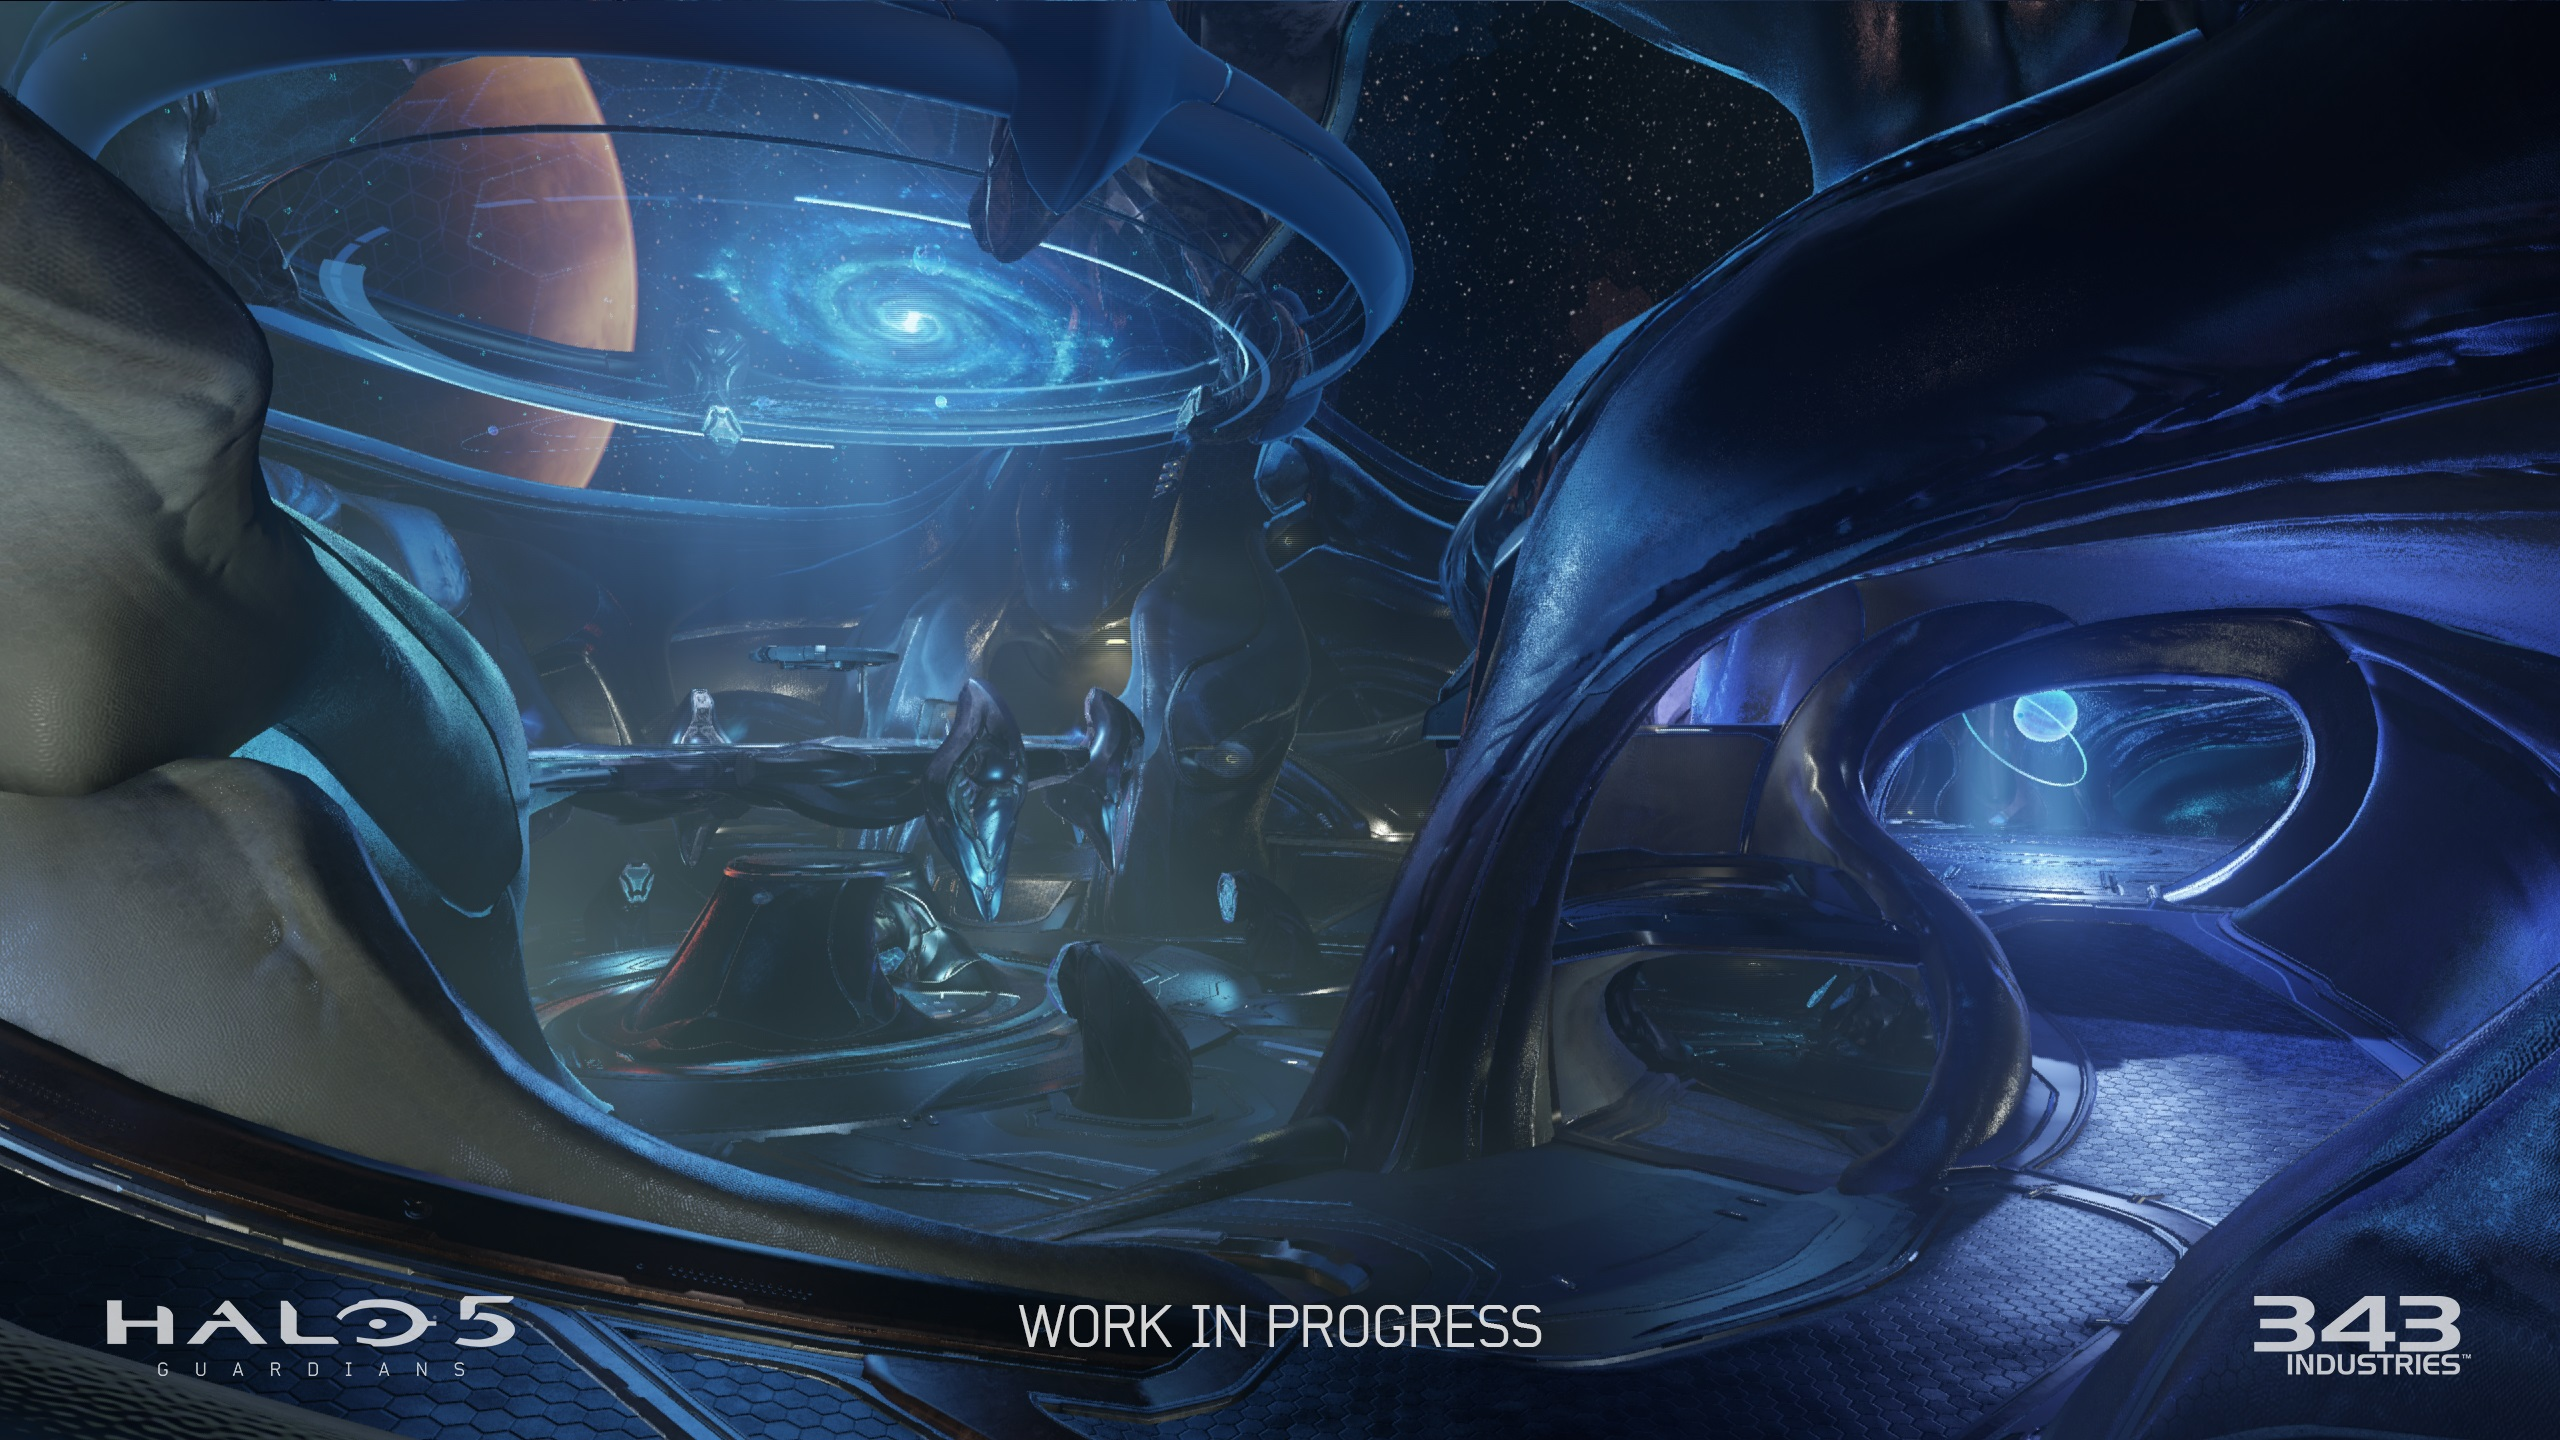 Halo 5 Guardians Video Game 41 Wallpaper Wallpaper 2560x1440